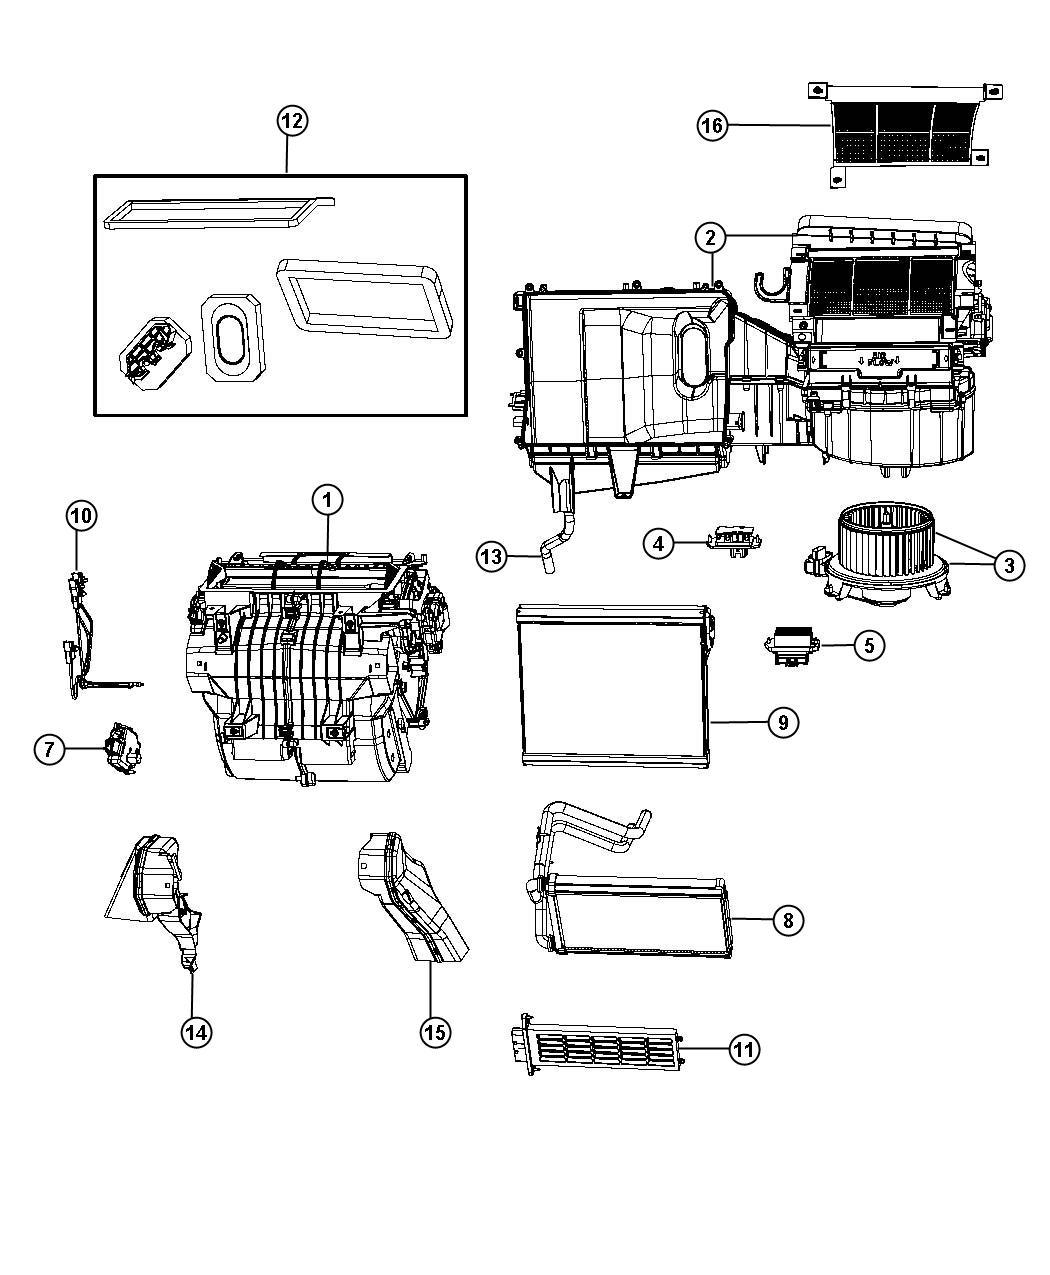 2013 Jeep Patriot Core  Heater  Instrument  Module  Panel